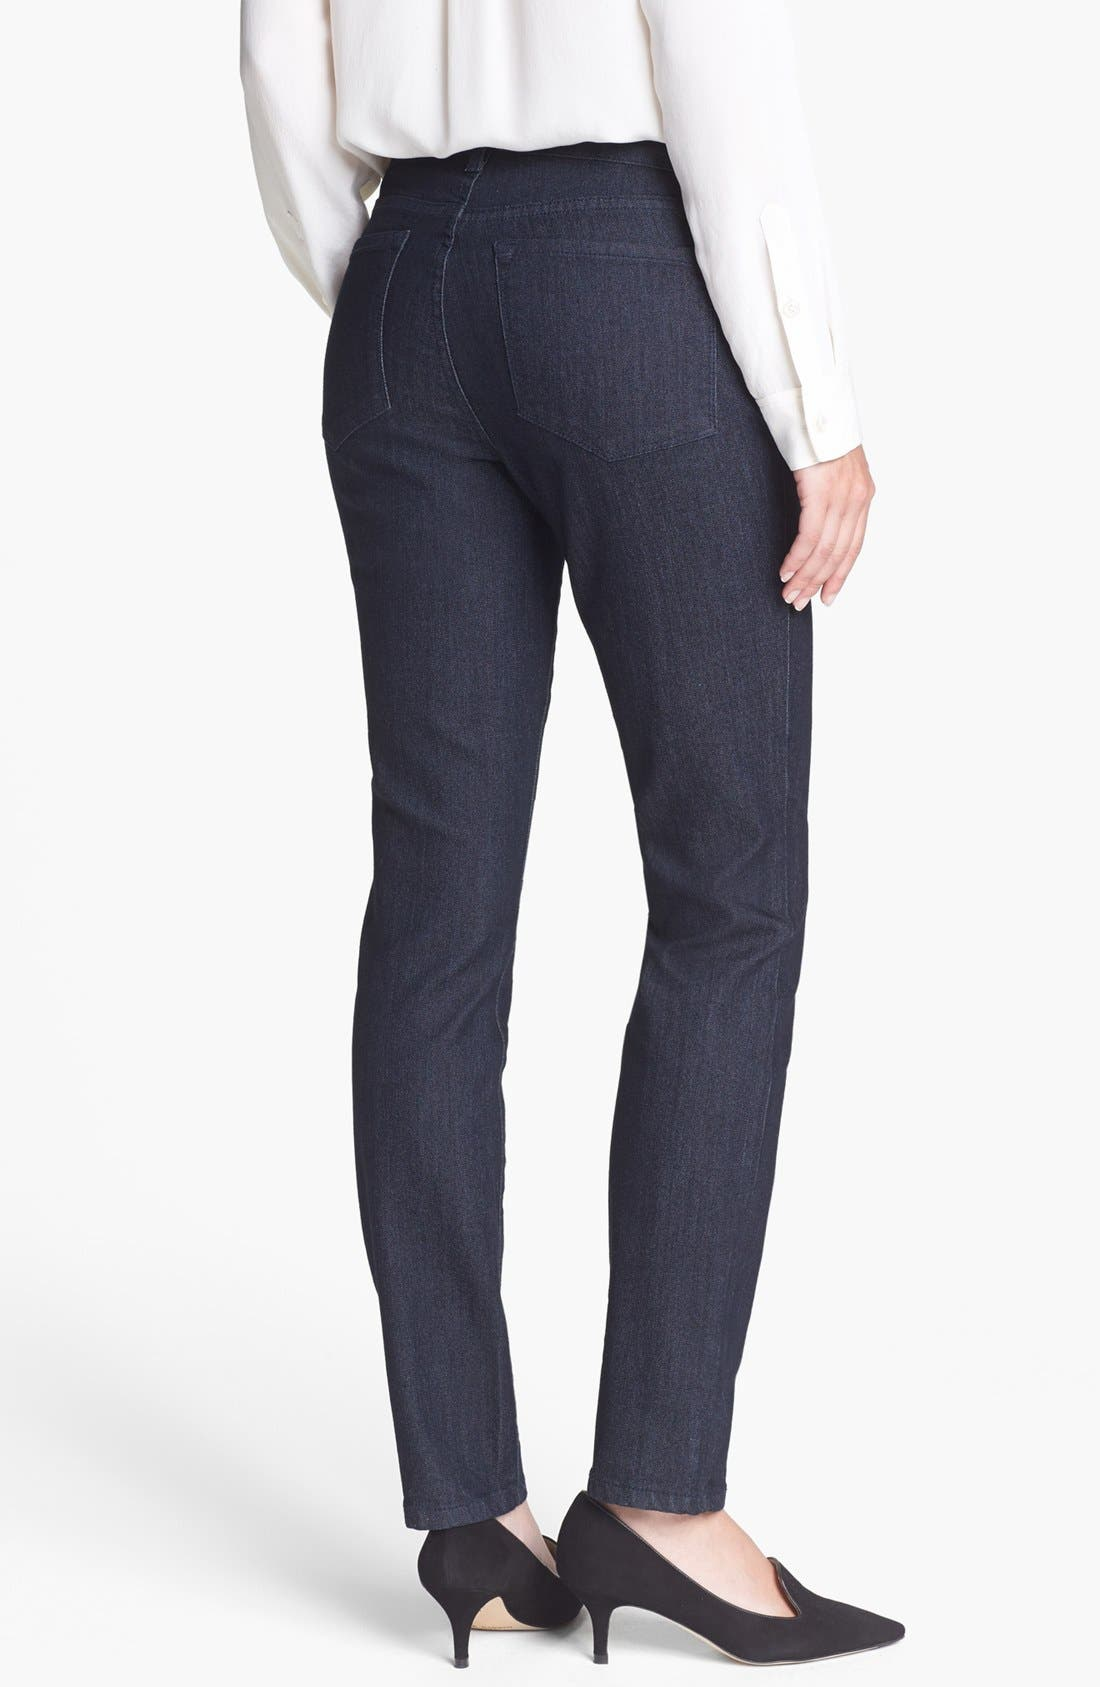 Alternate Image 2  - NYDJ 'Alina' Stretch Skinny Jeans (Dark Enzyme) (Petite)